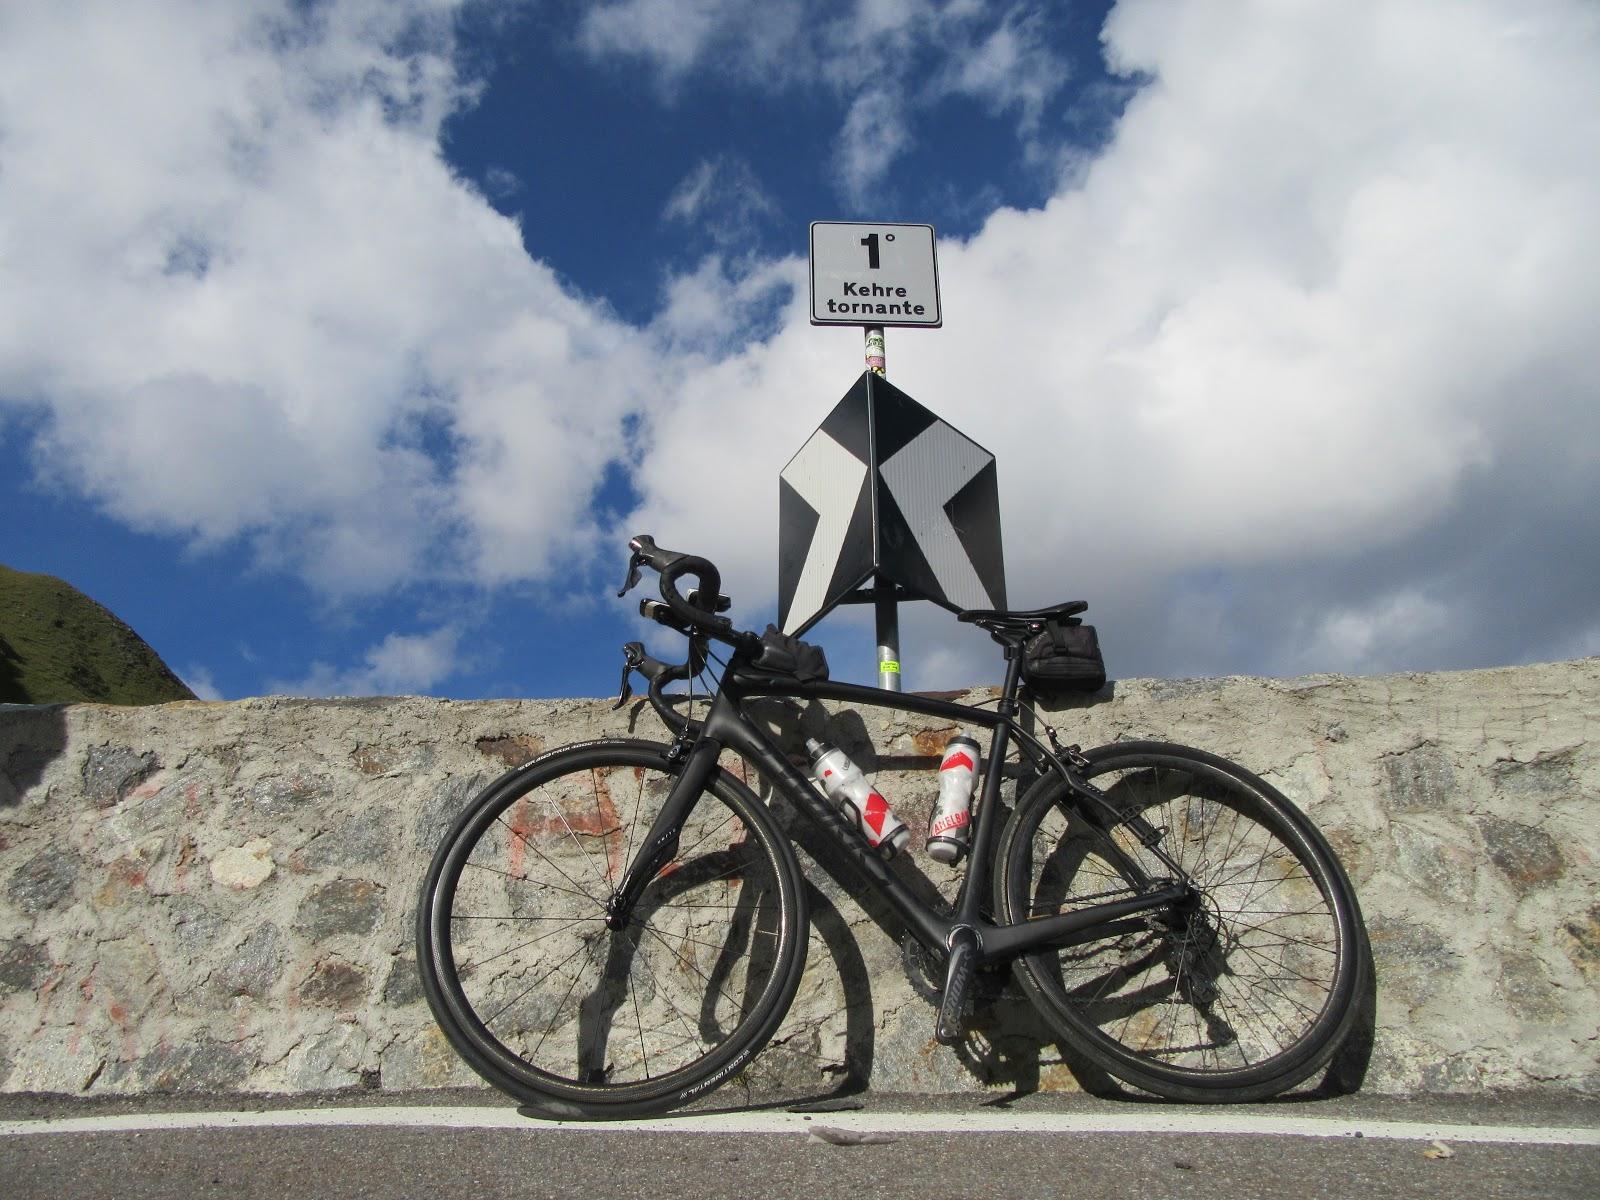 Cycling Stelvio from Prato - tornante (hairpin) #1 with bike below